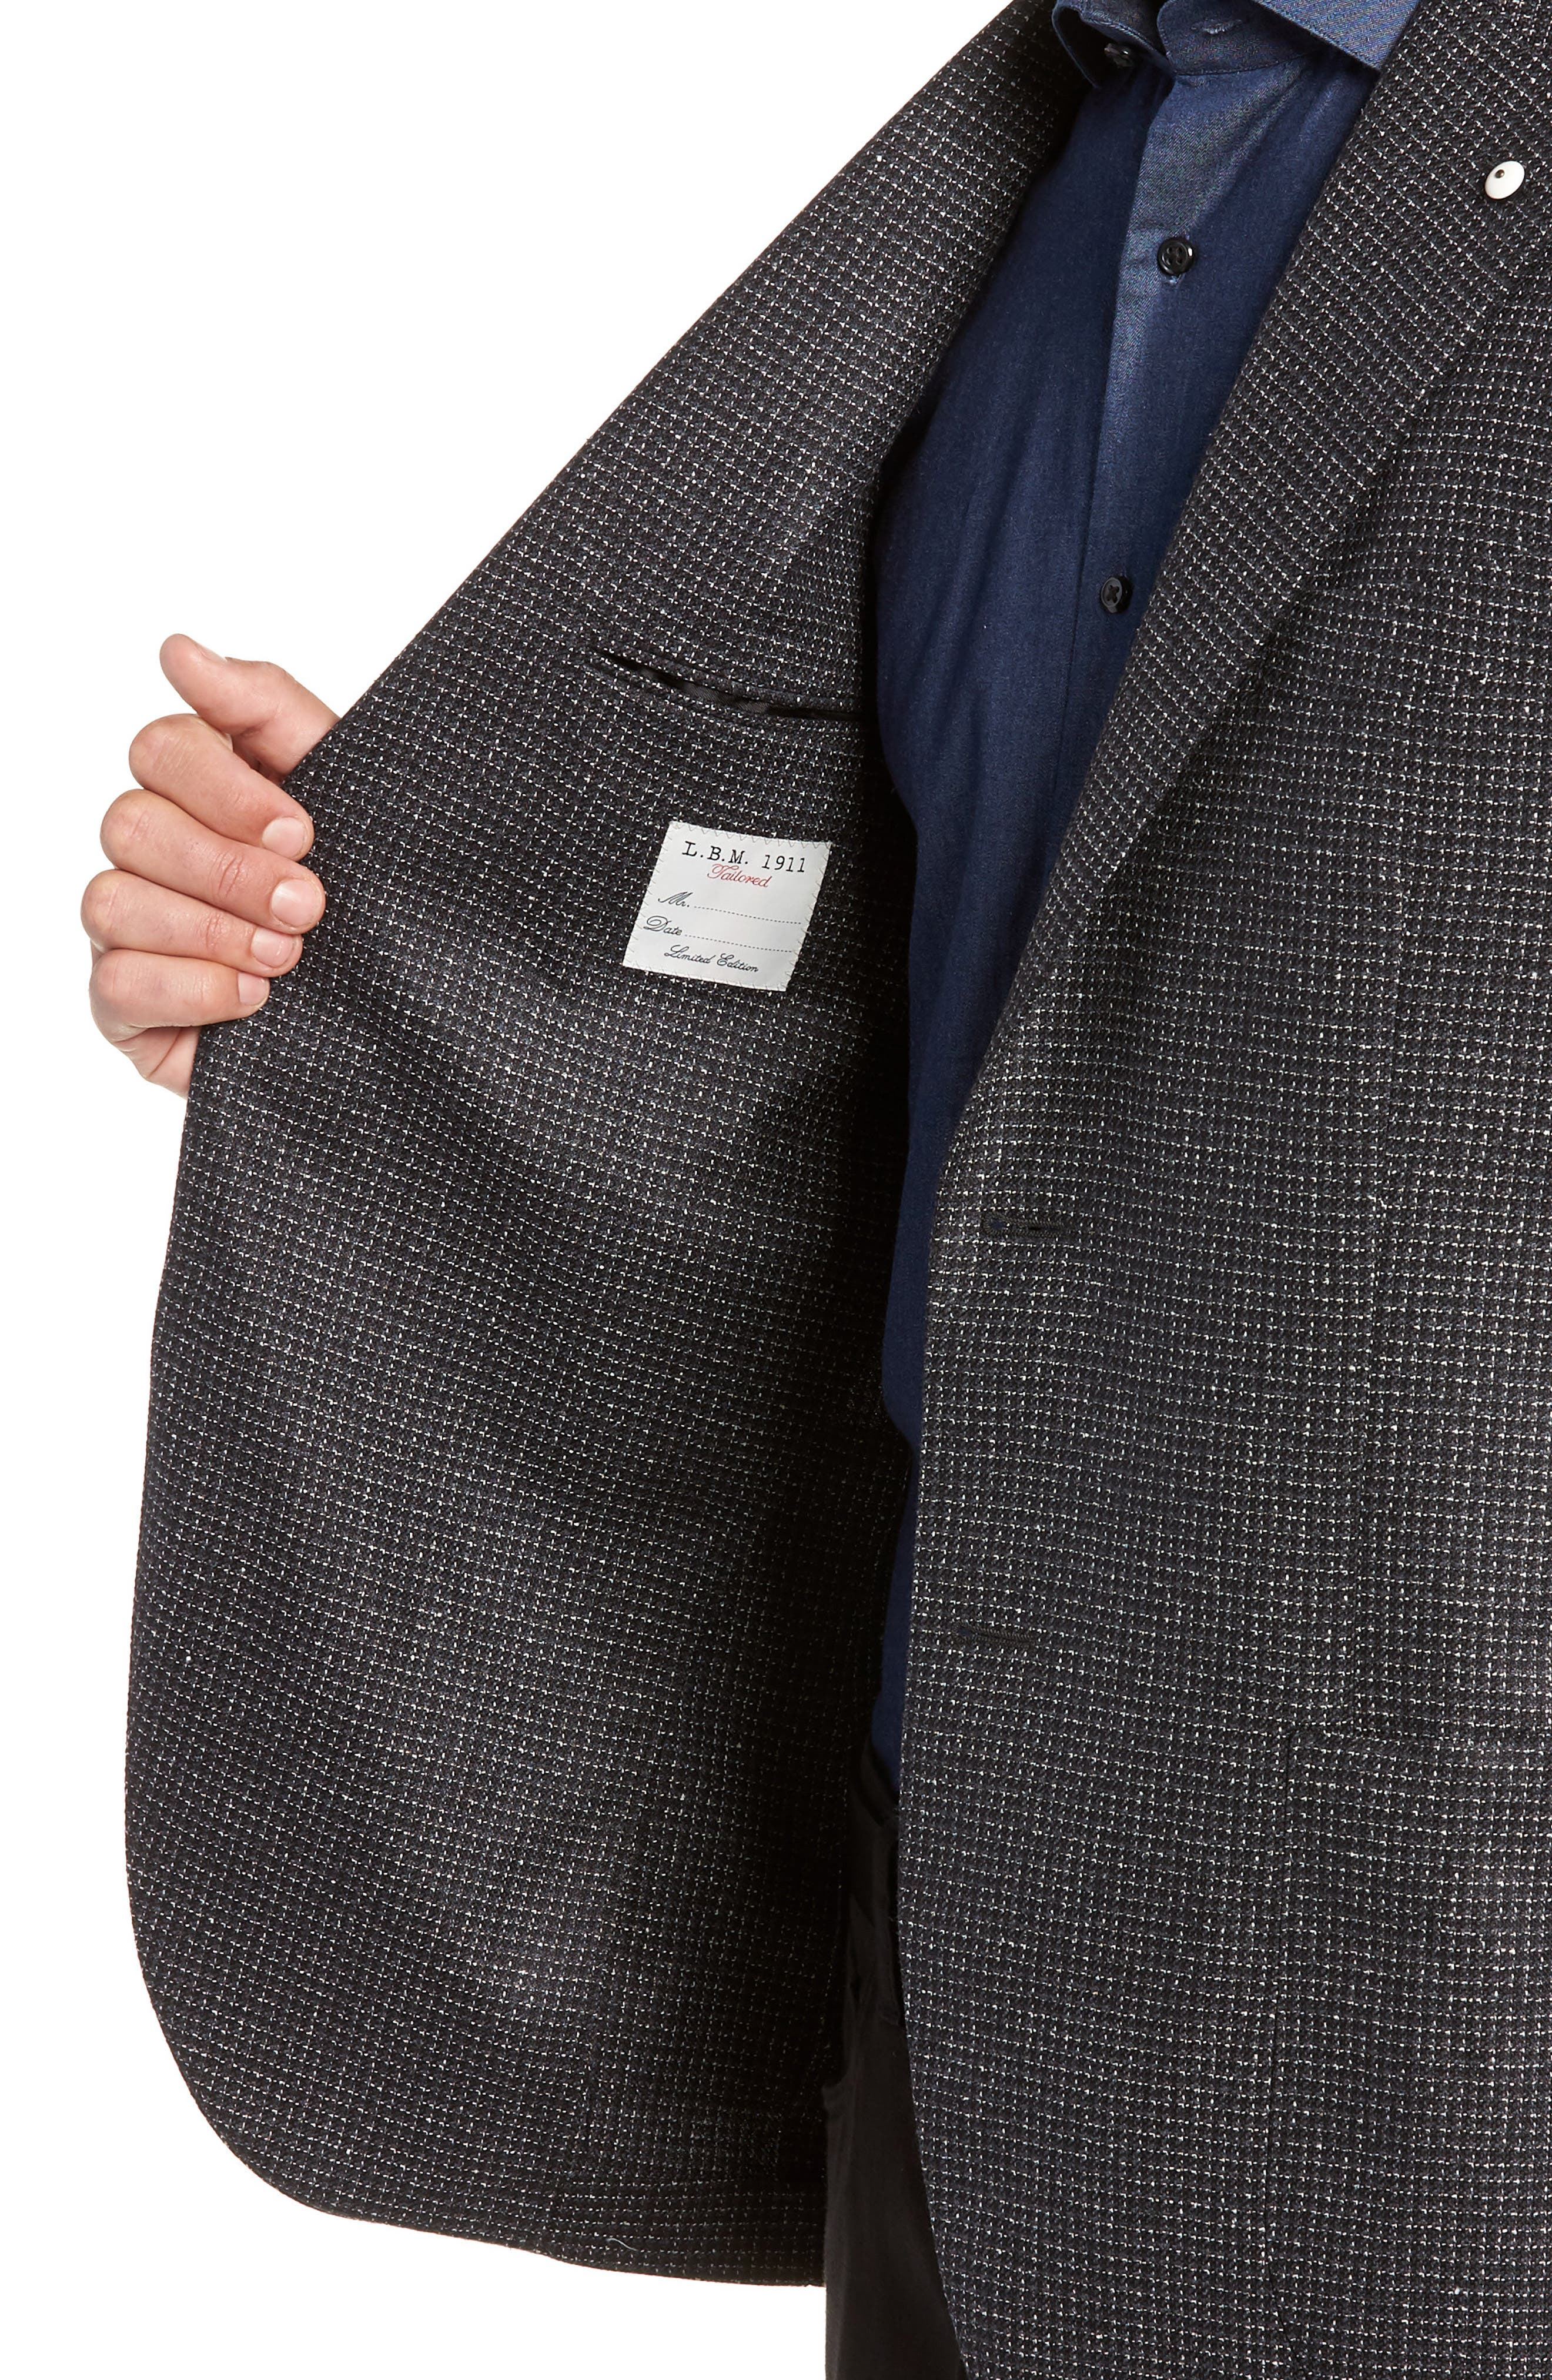 L.B.M 1911 Classic Fit Silk & Wool Sport Coat,                             Alternate thumbnail 4, color,                             BLACK